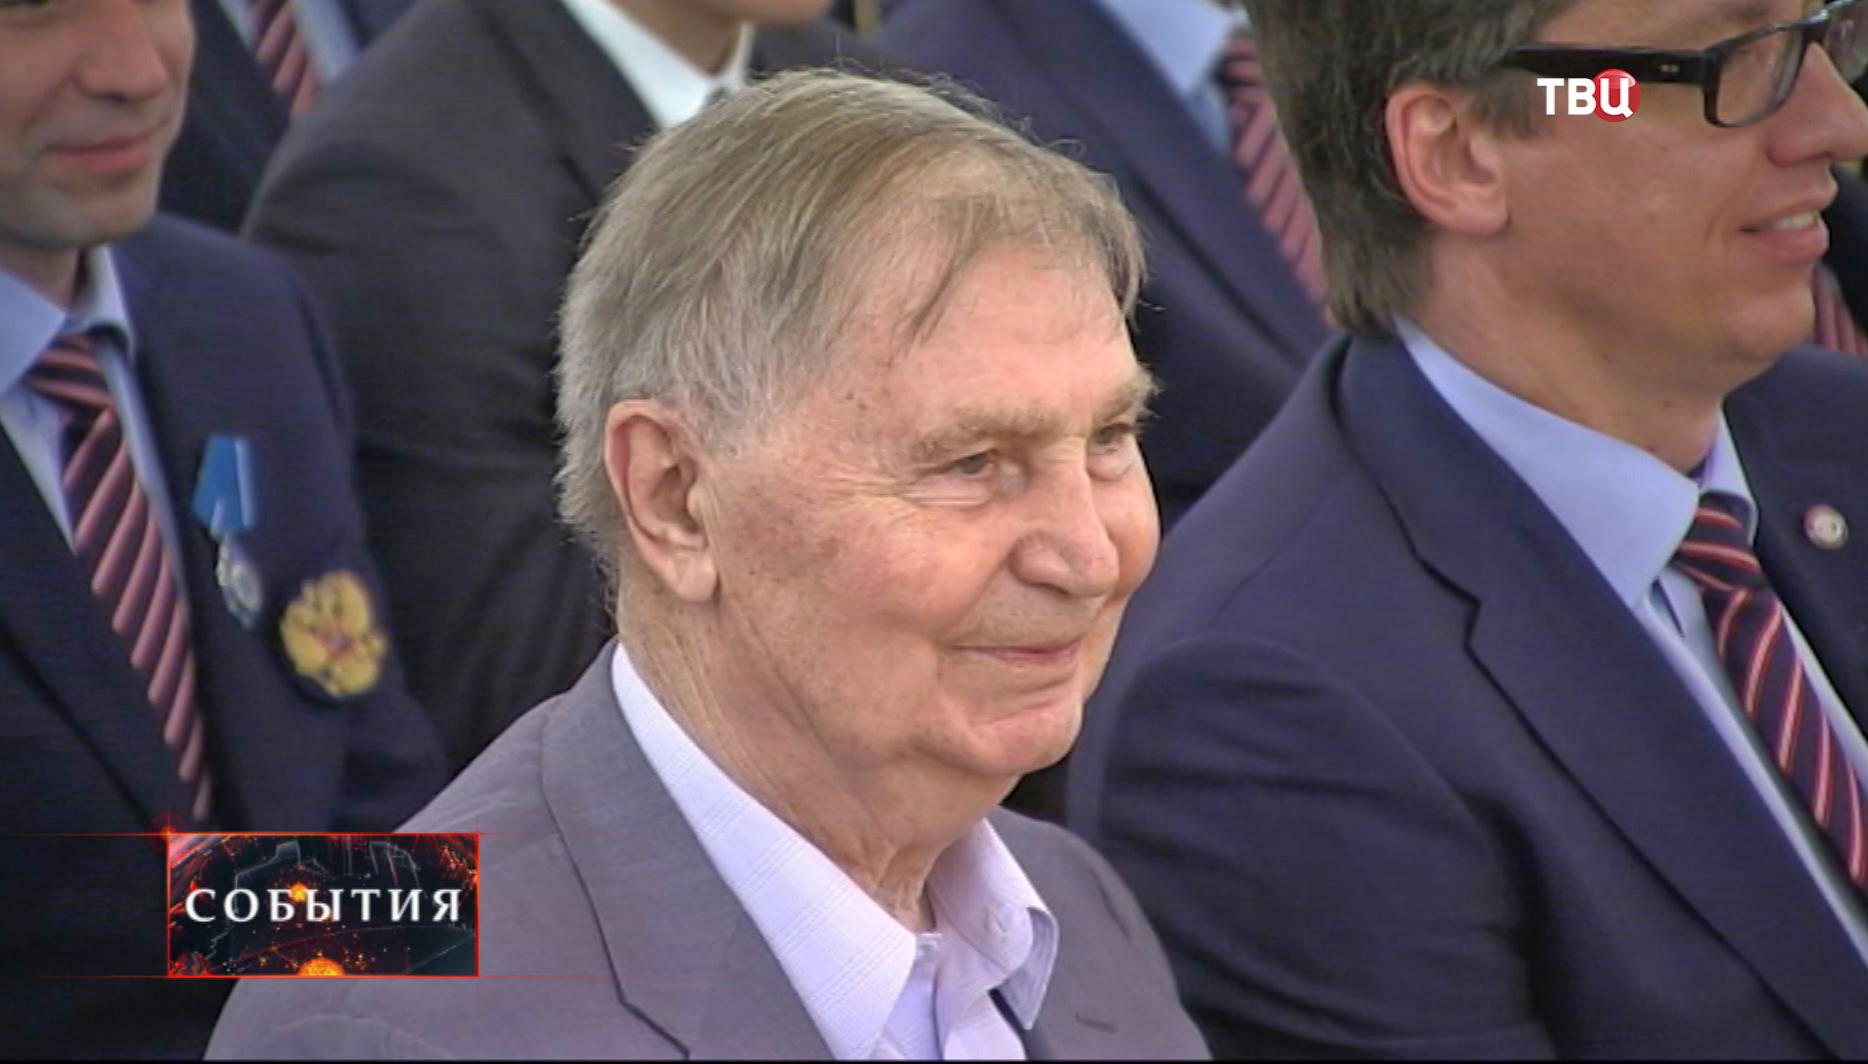 Хоккеист и тренер Виктор Тихонов